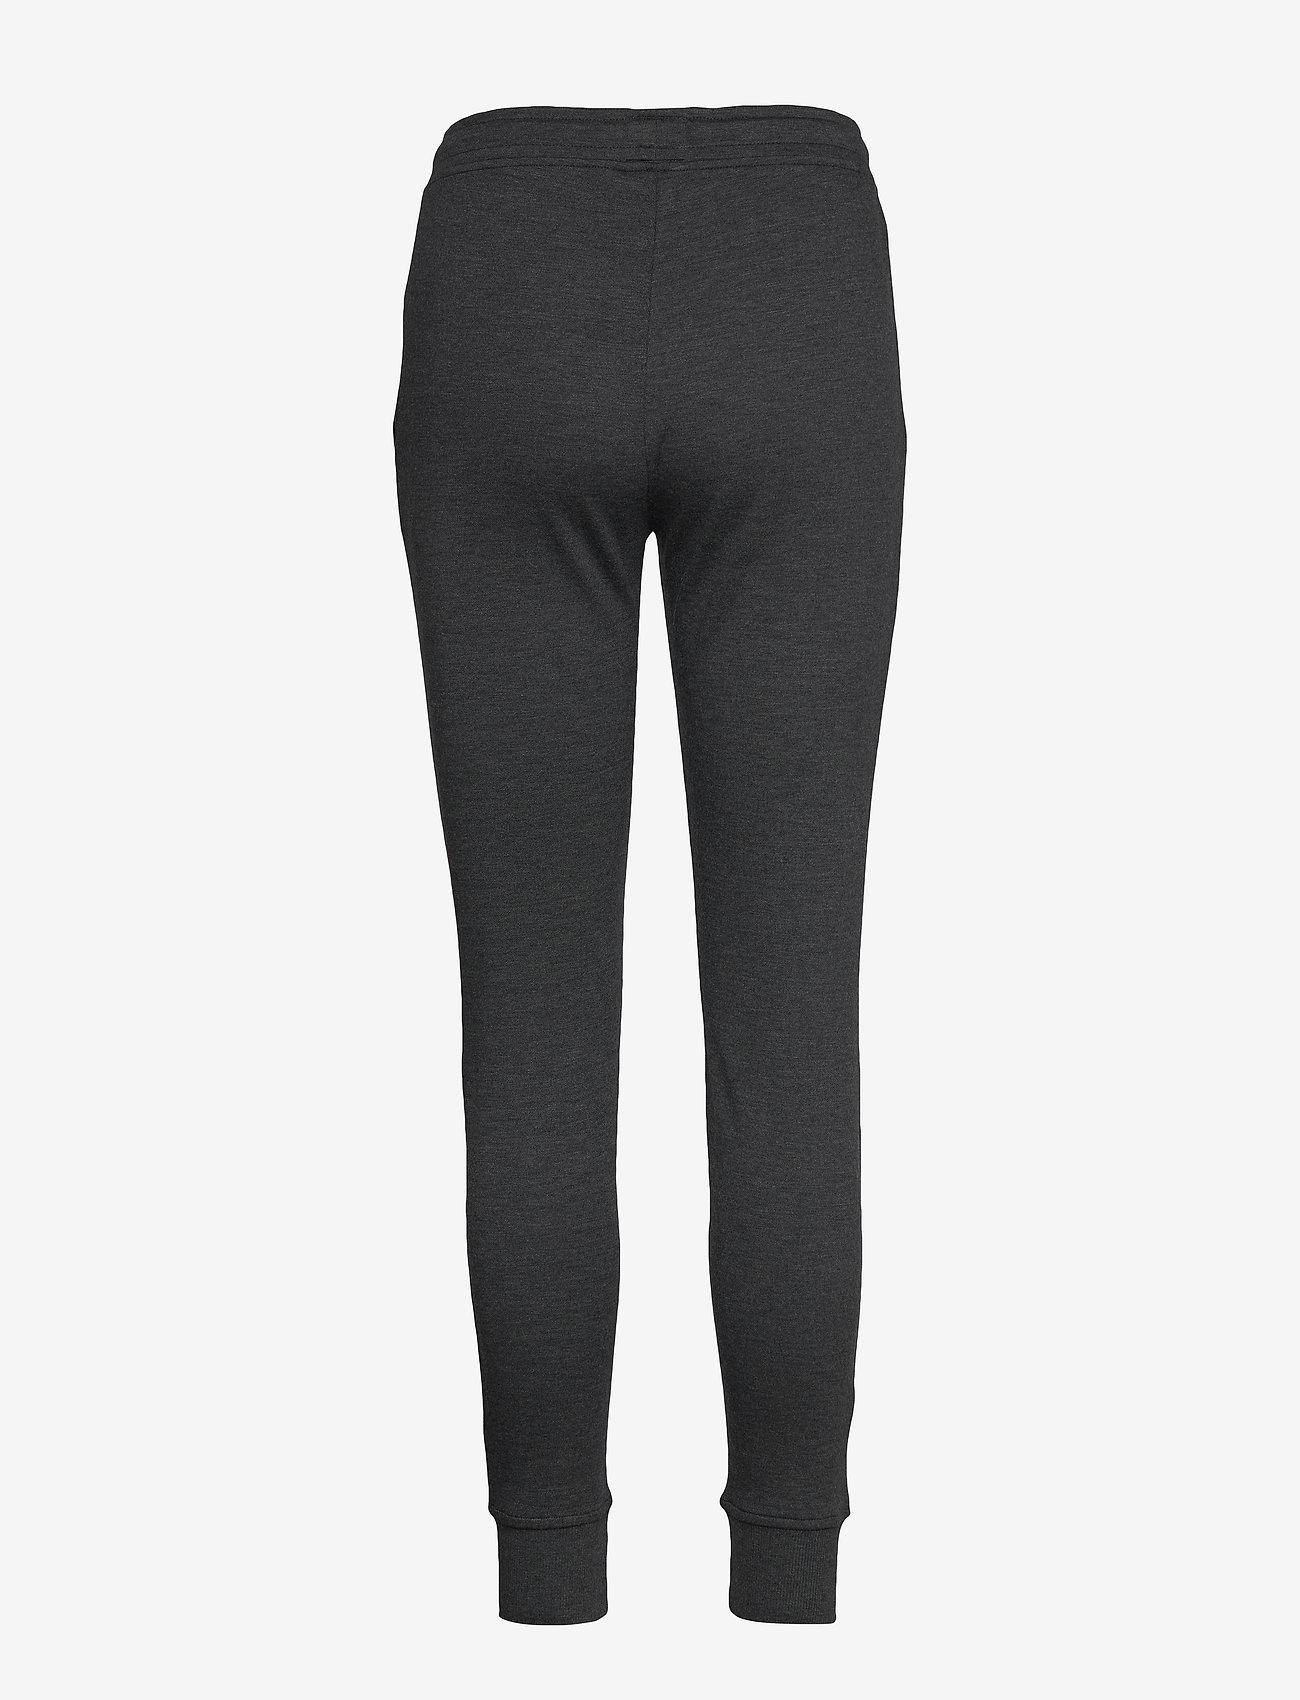 JBS of Denmark - JBS of Denmark sweat pants bam - sweatpants - dark gray - 1